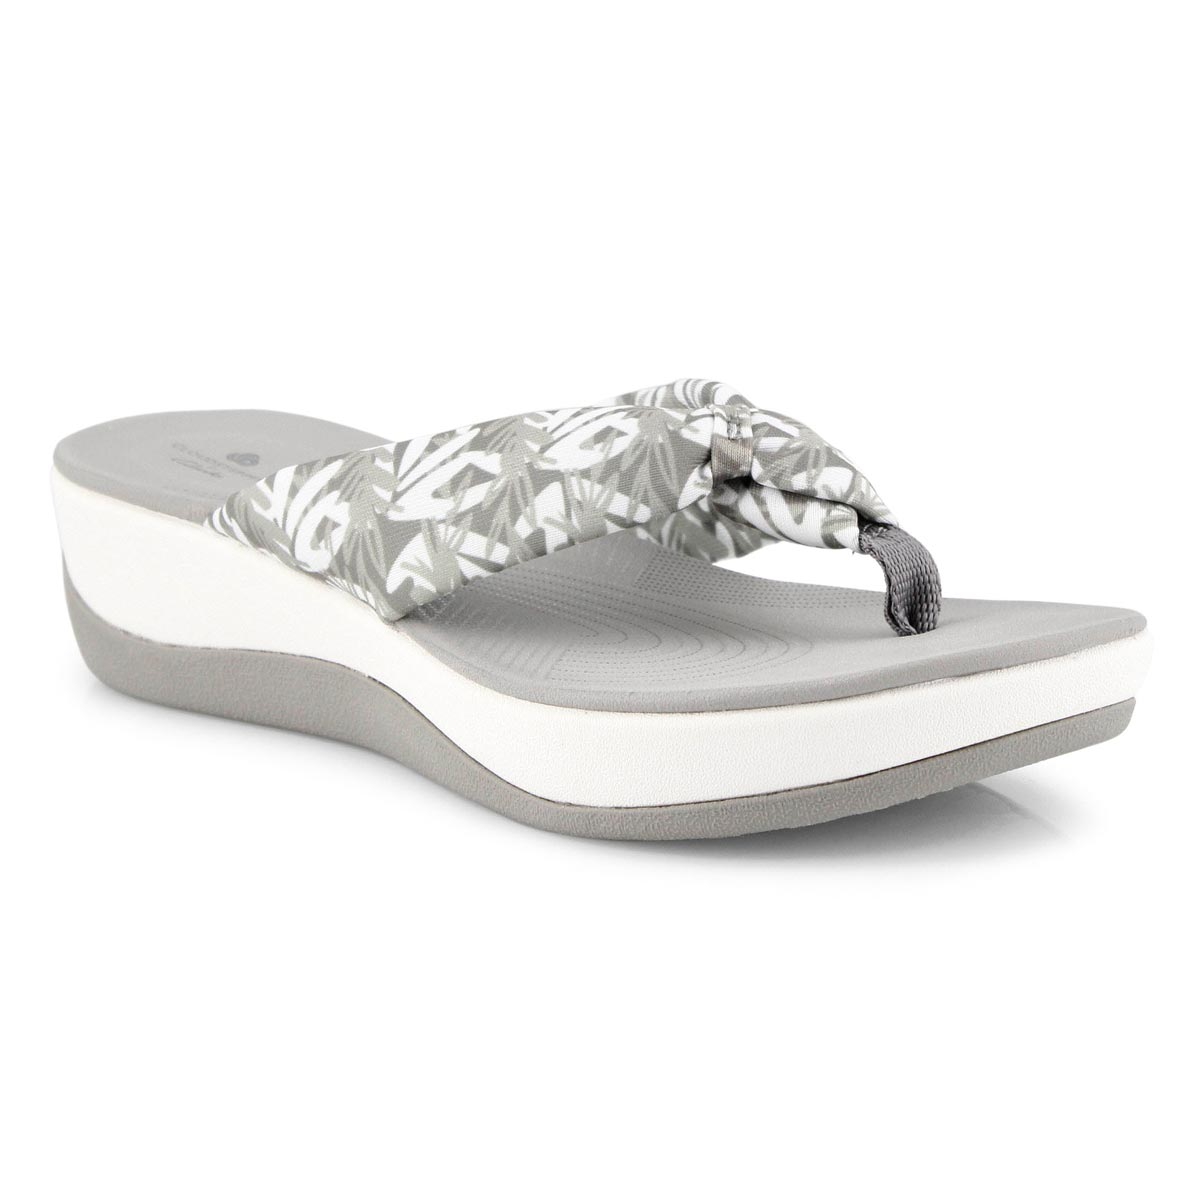 Women's Arla Glison Thong Wedge Sandal - Flor Gry